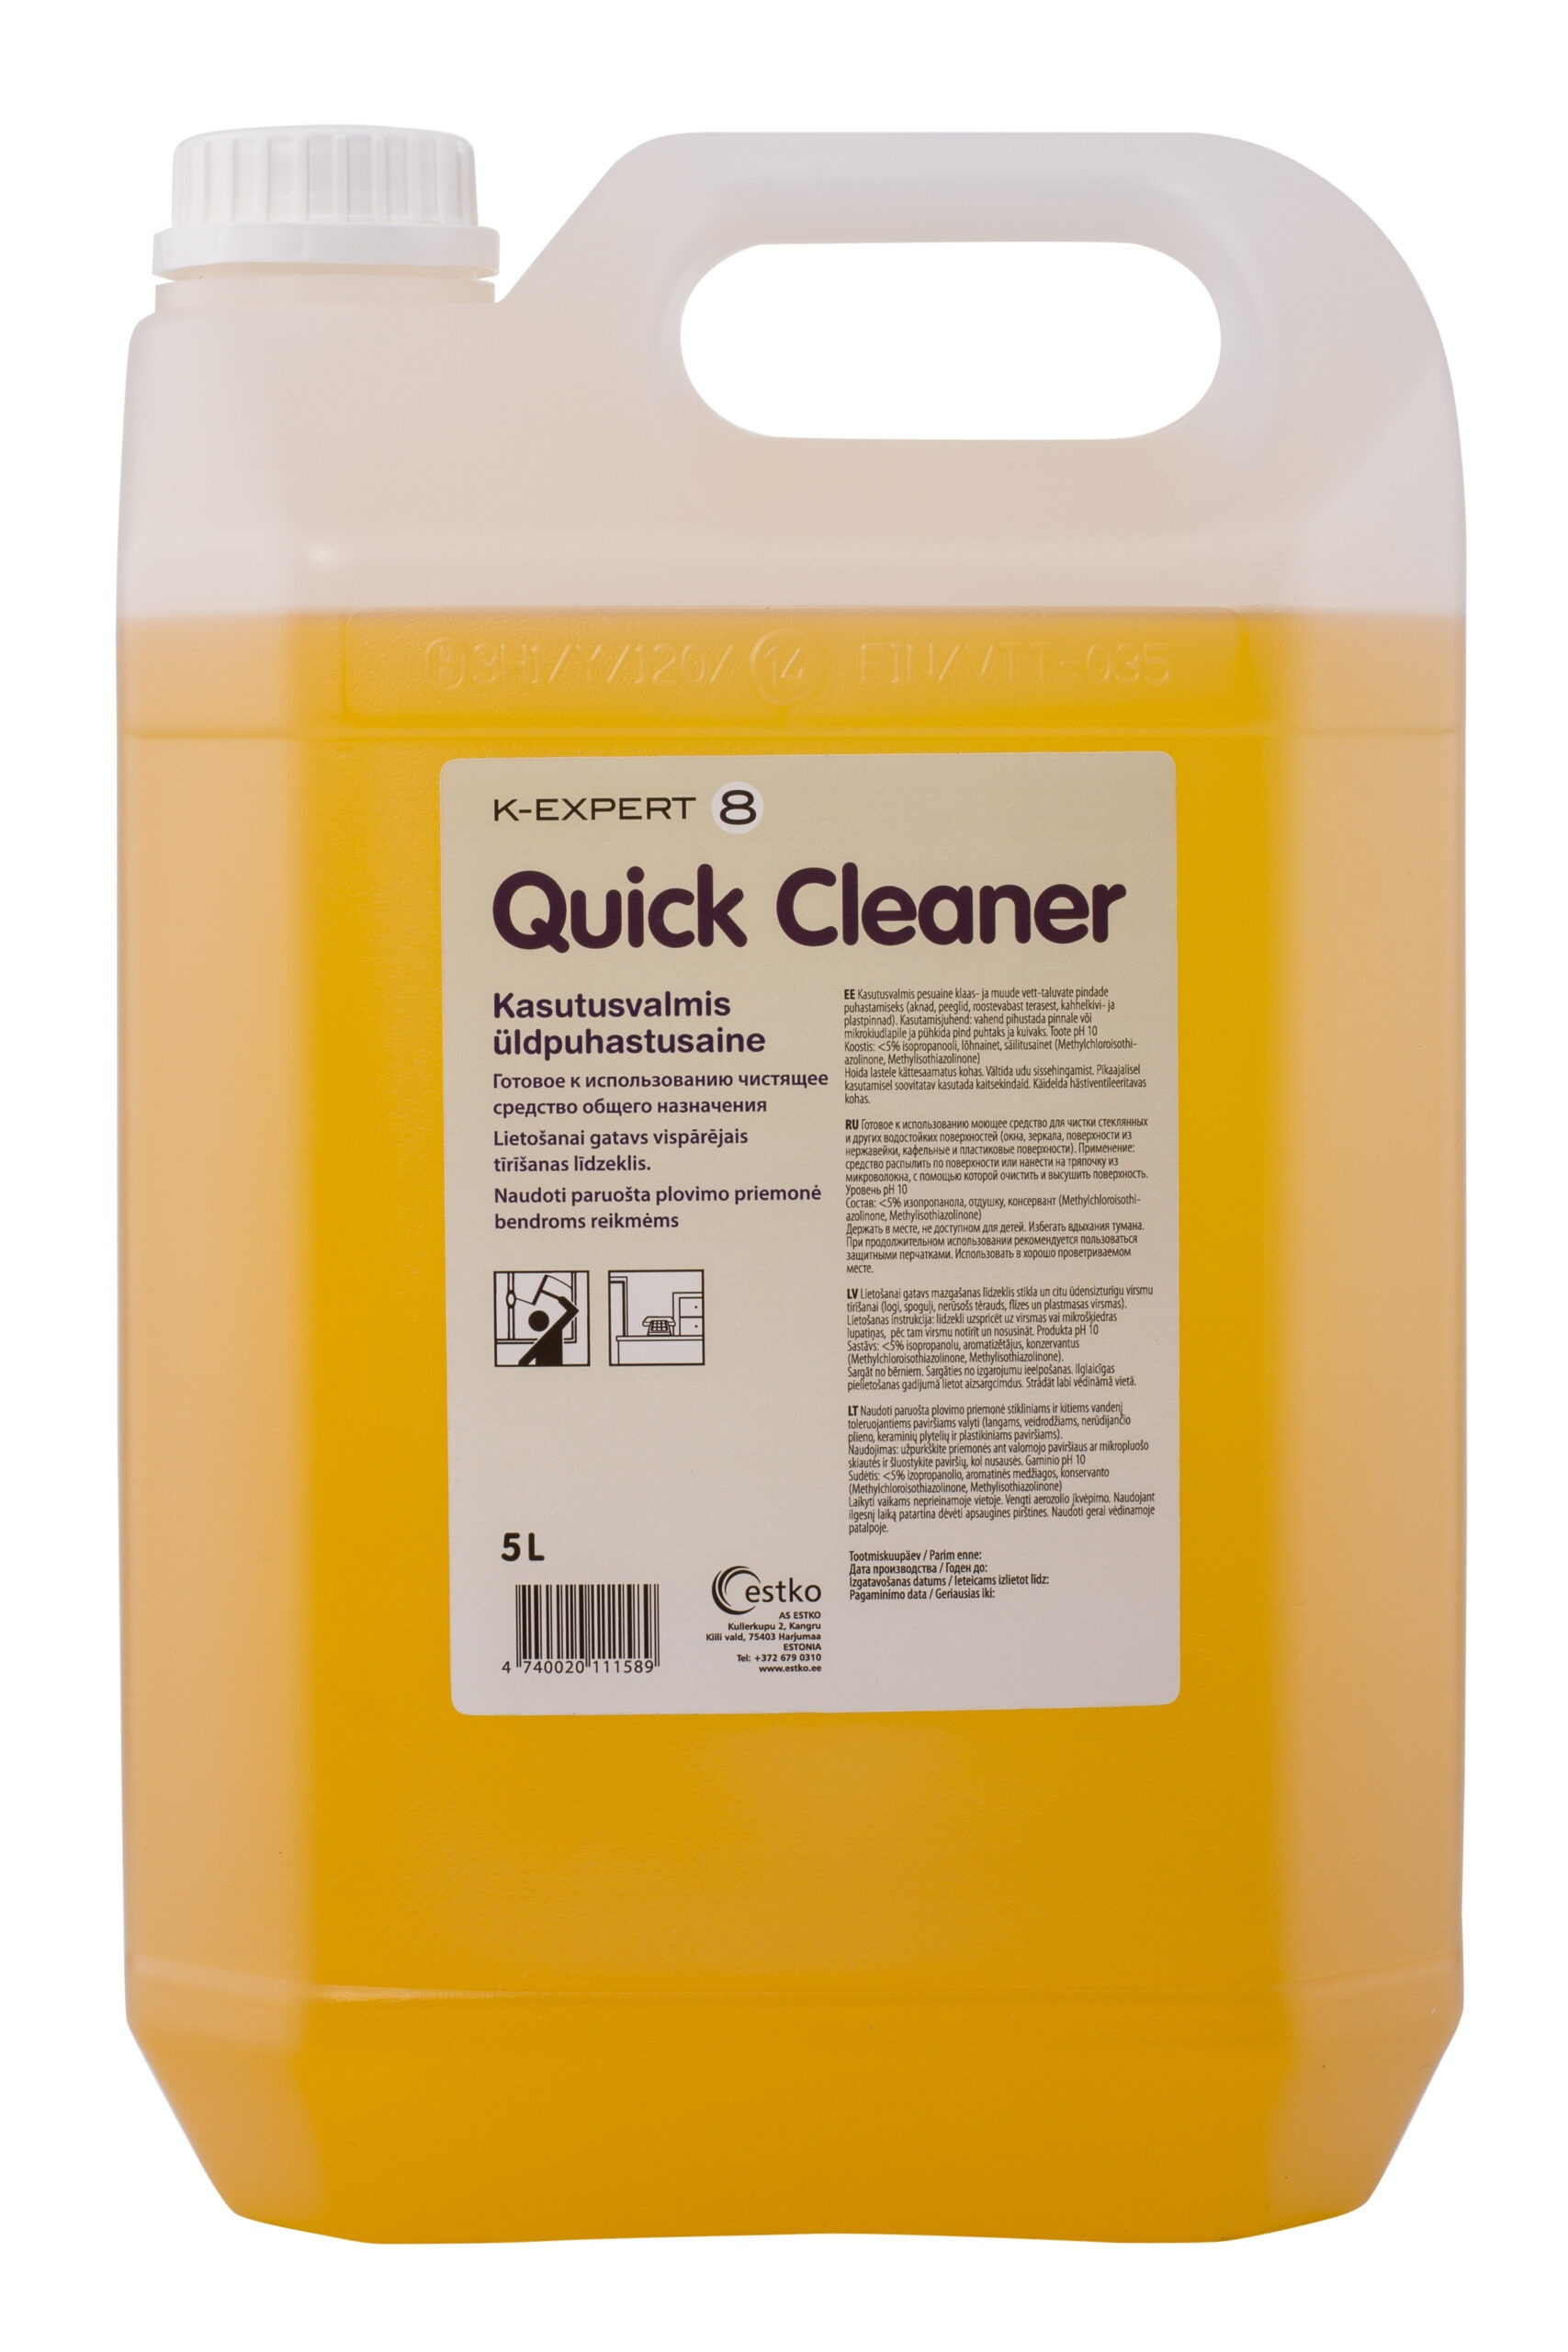 K-Expert 8 Quick Cleaner